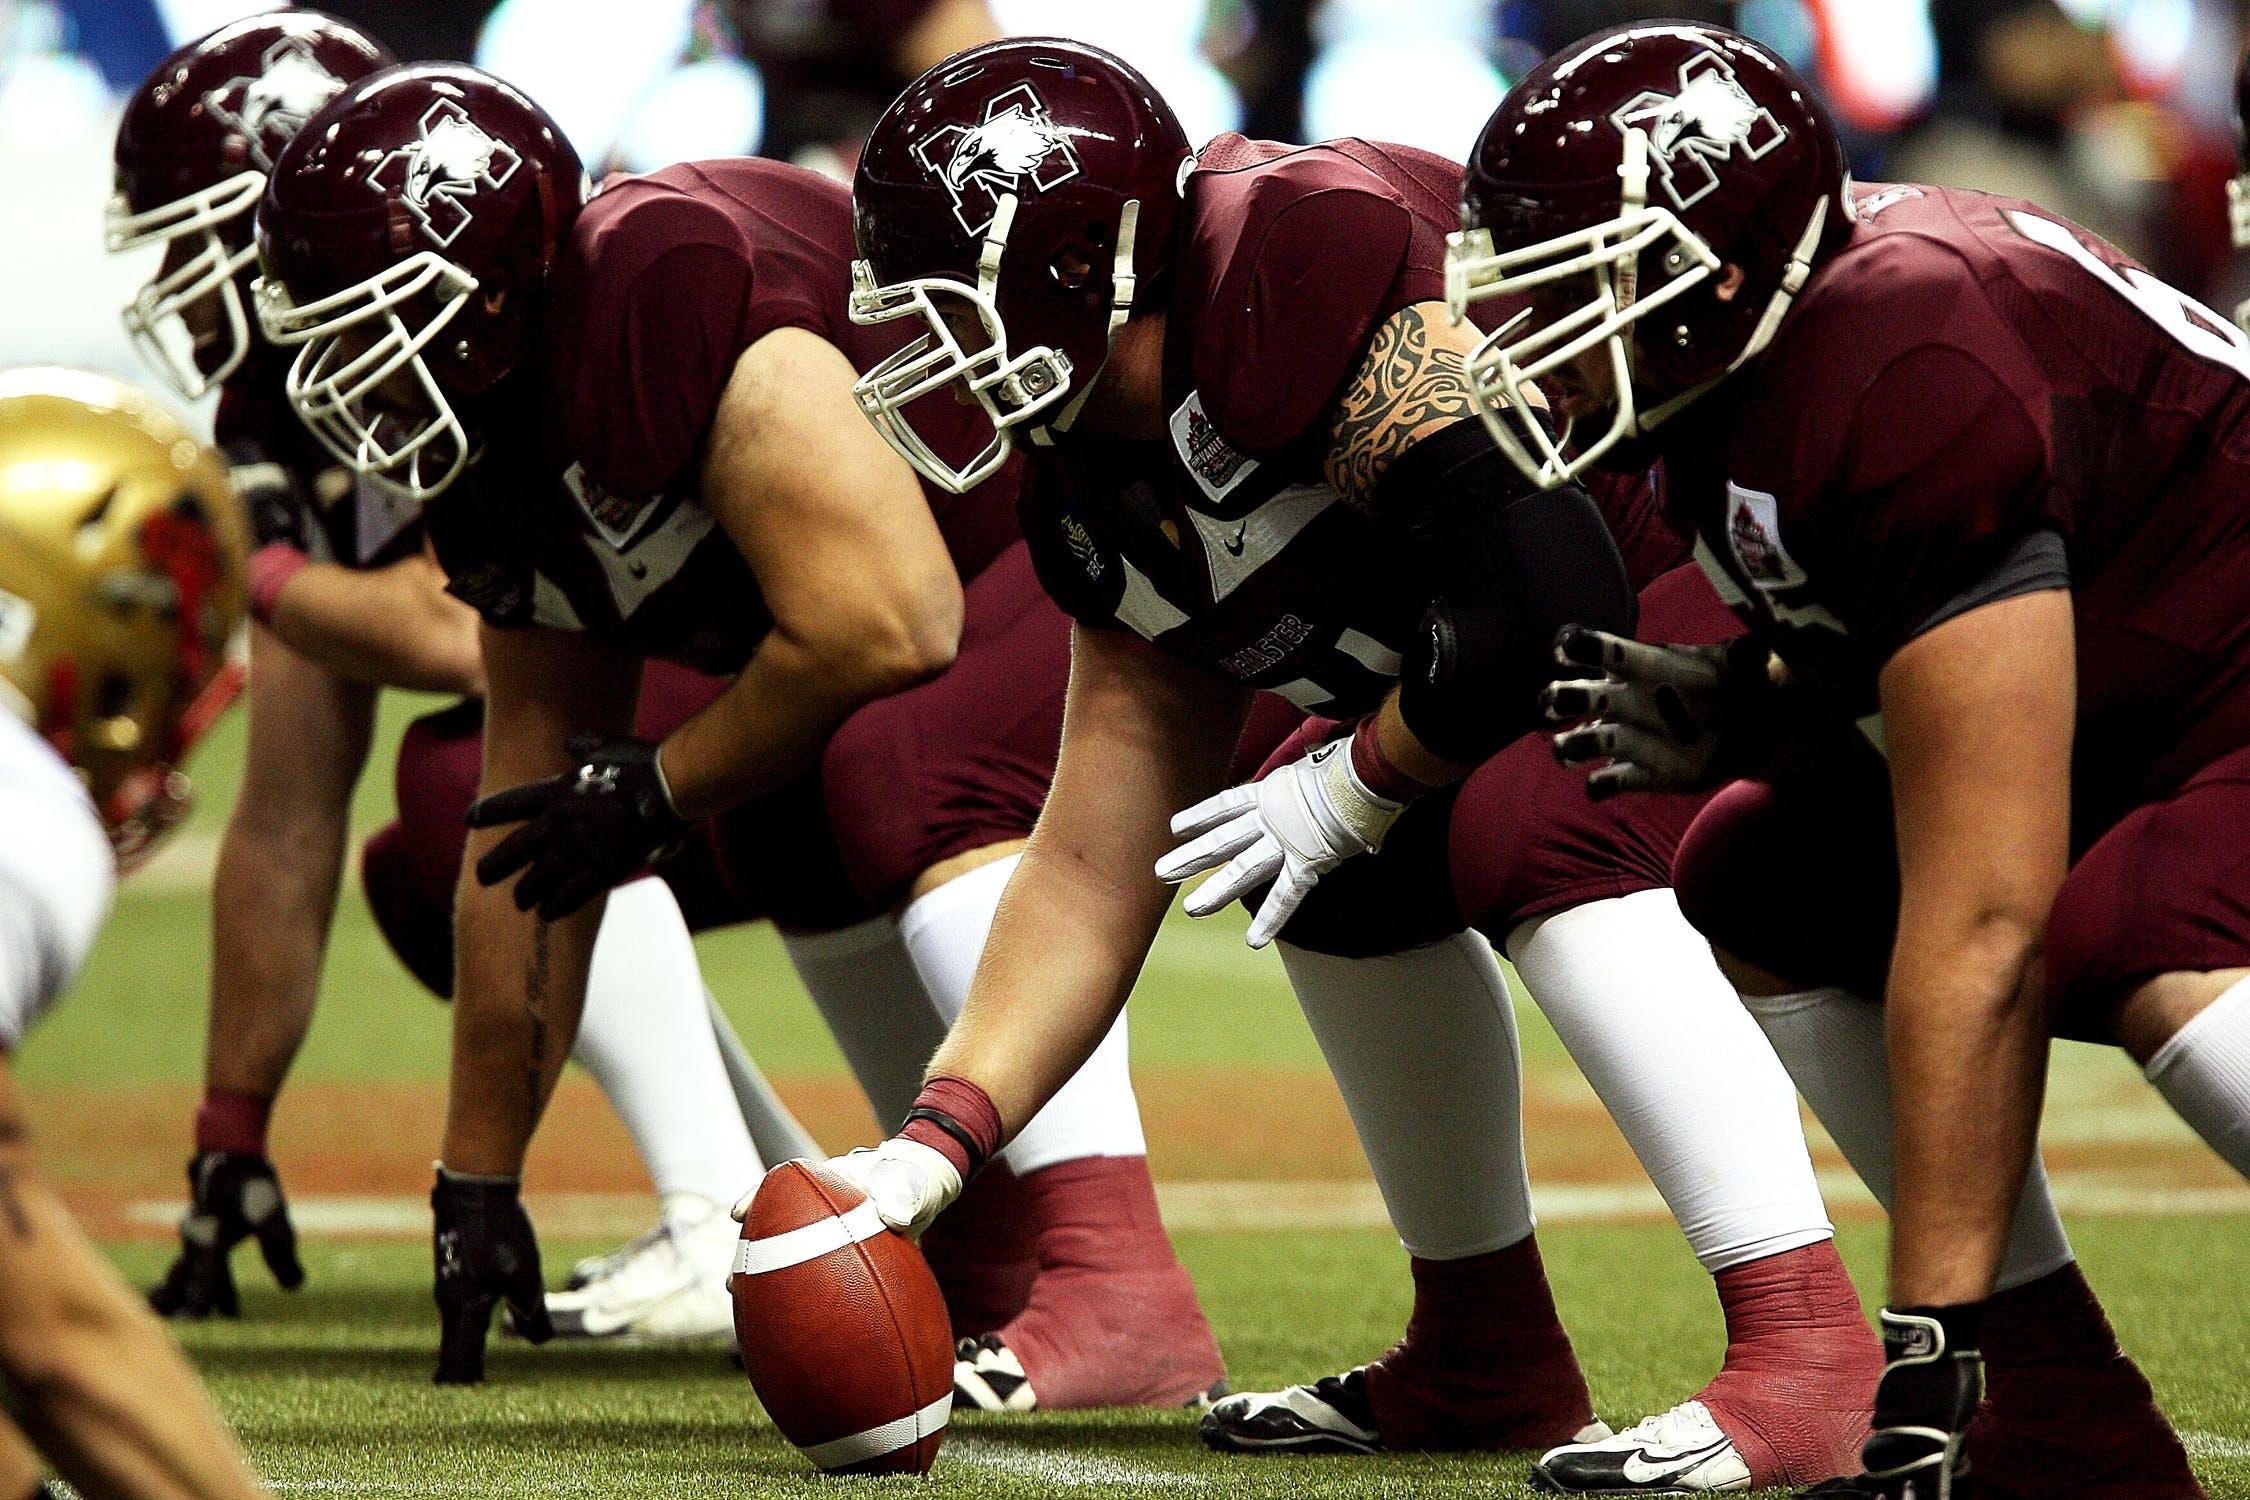 football-american-football-canadian-university-canadian-football-163398.0.jpeg